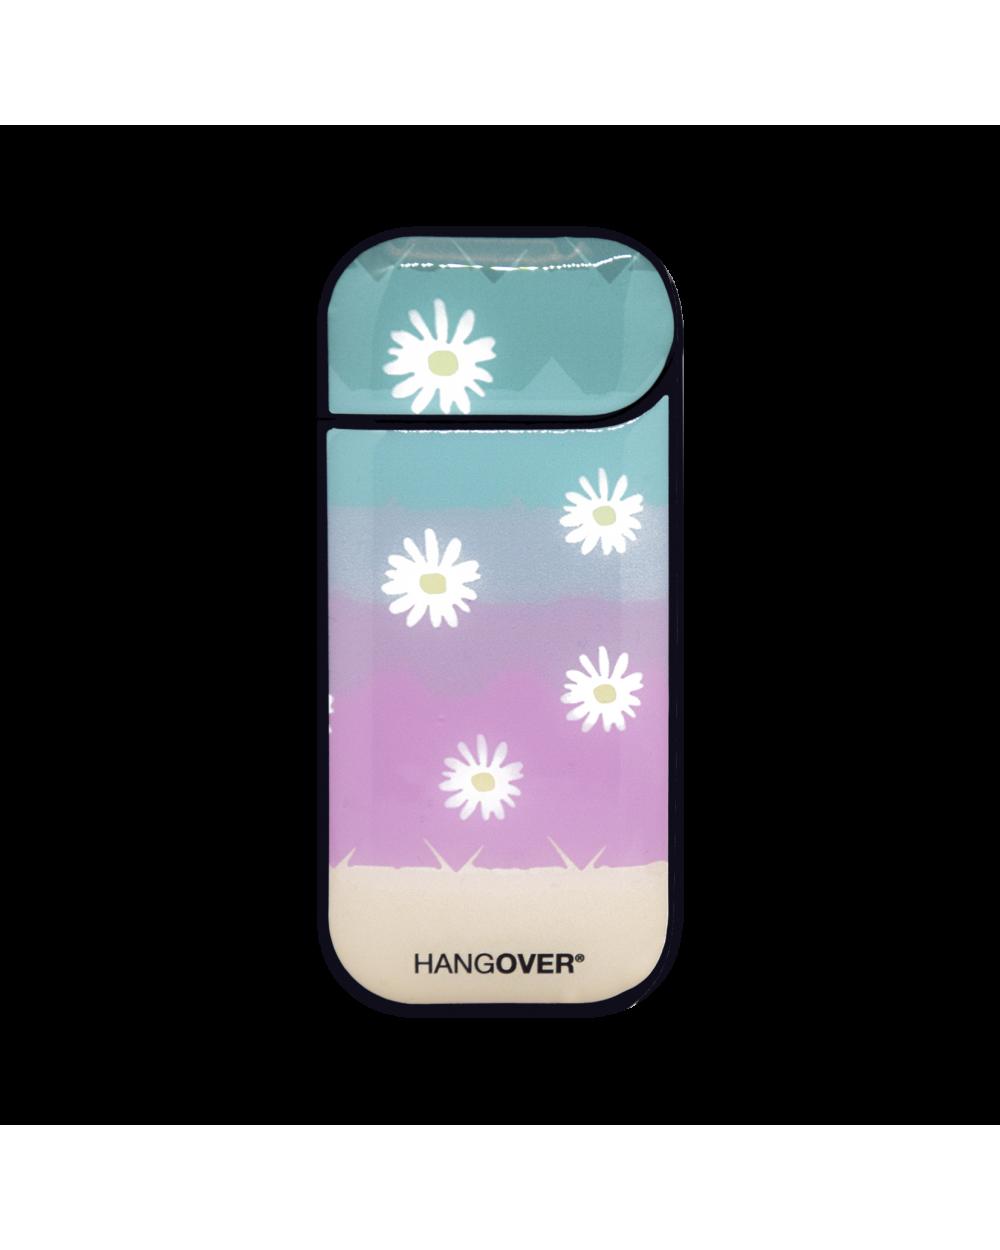 Flower Garden - Cover SmartSkin Adesiva in Resina Speciale per Iqos 2.4 e 2.4 plus by Hangover